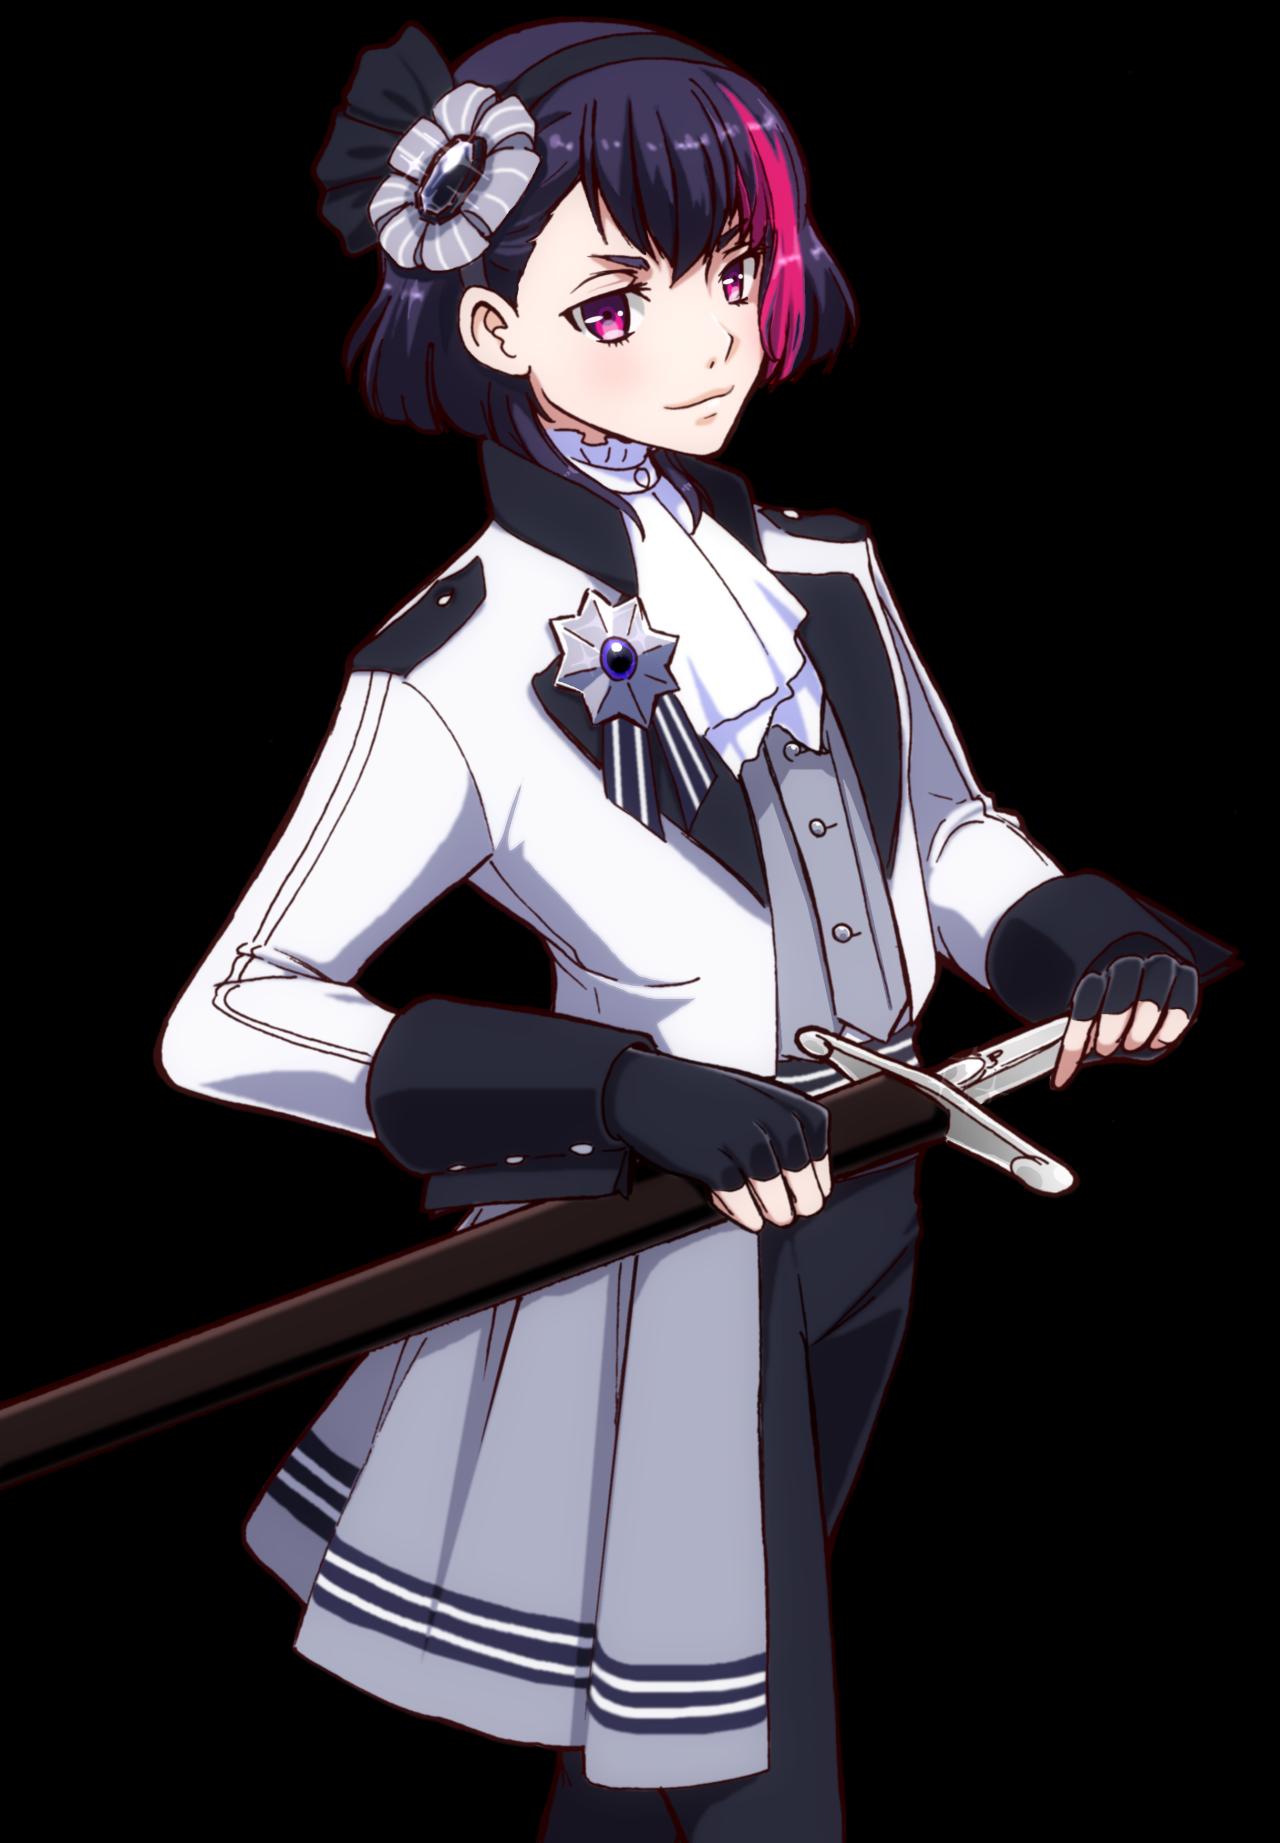 Ryuuji Korekuni Anime BProject Kodou*Ambitious